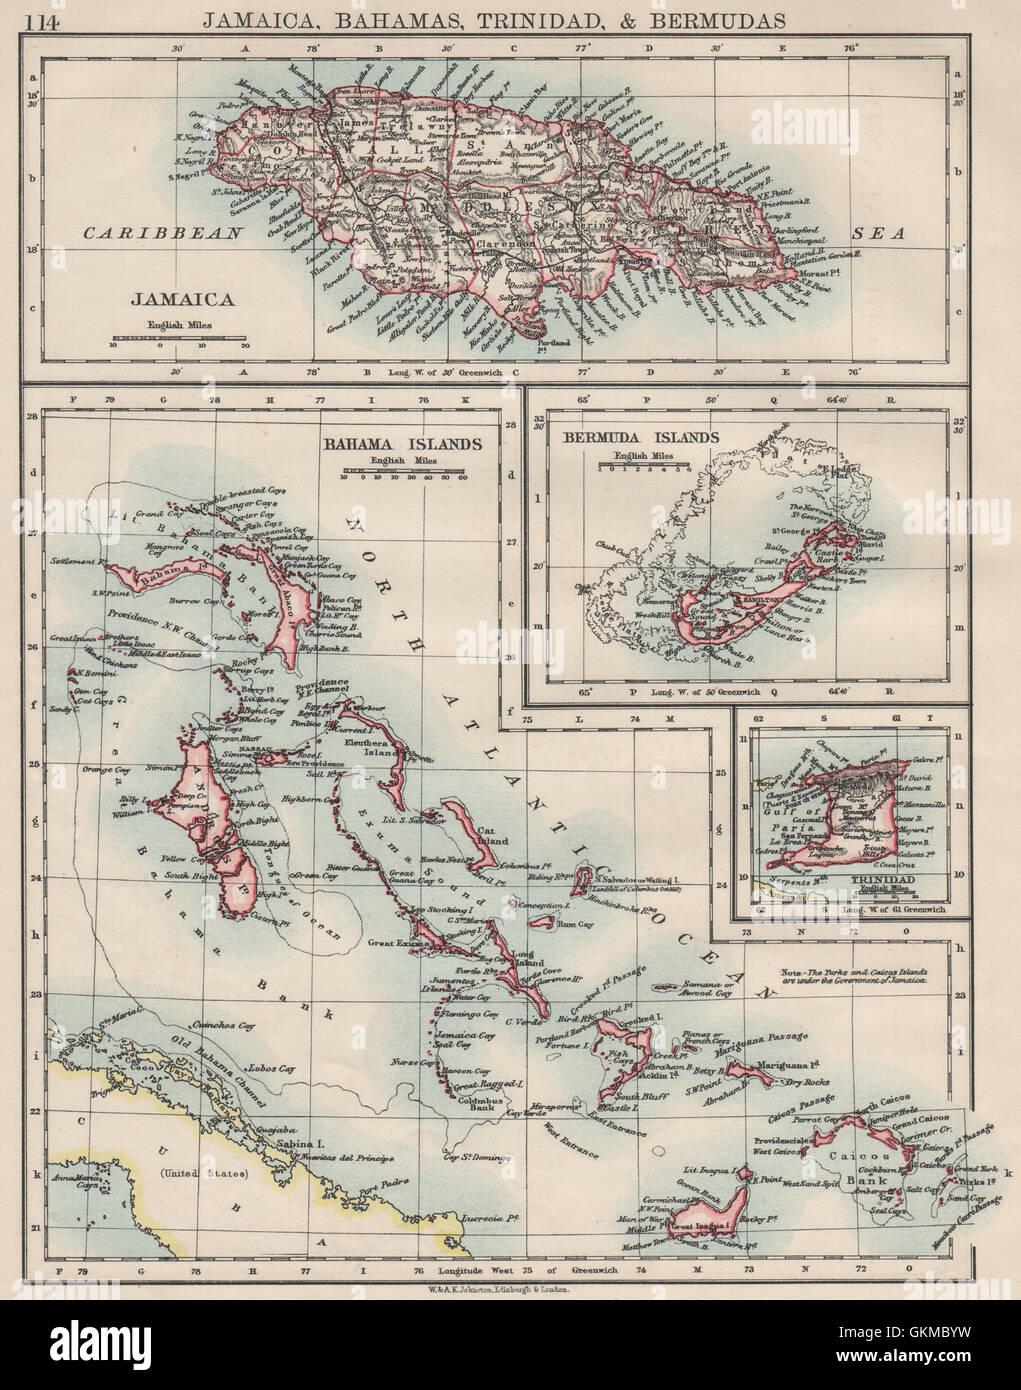 Caribbeanatlantic islandsjamaica bermuda bahamas trinidad stock jamaica bermuda bahamas trinidad johnston 1900 map gumiabroncs Image collections